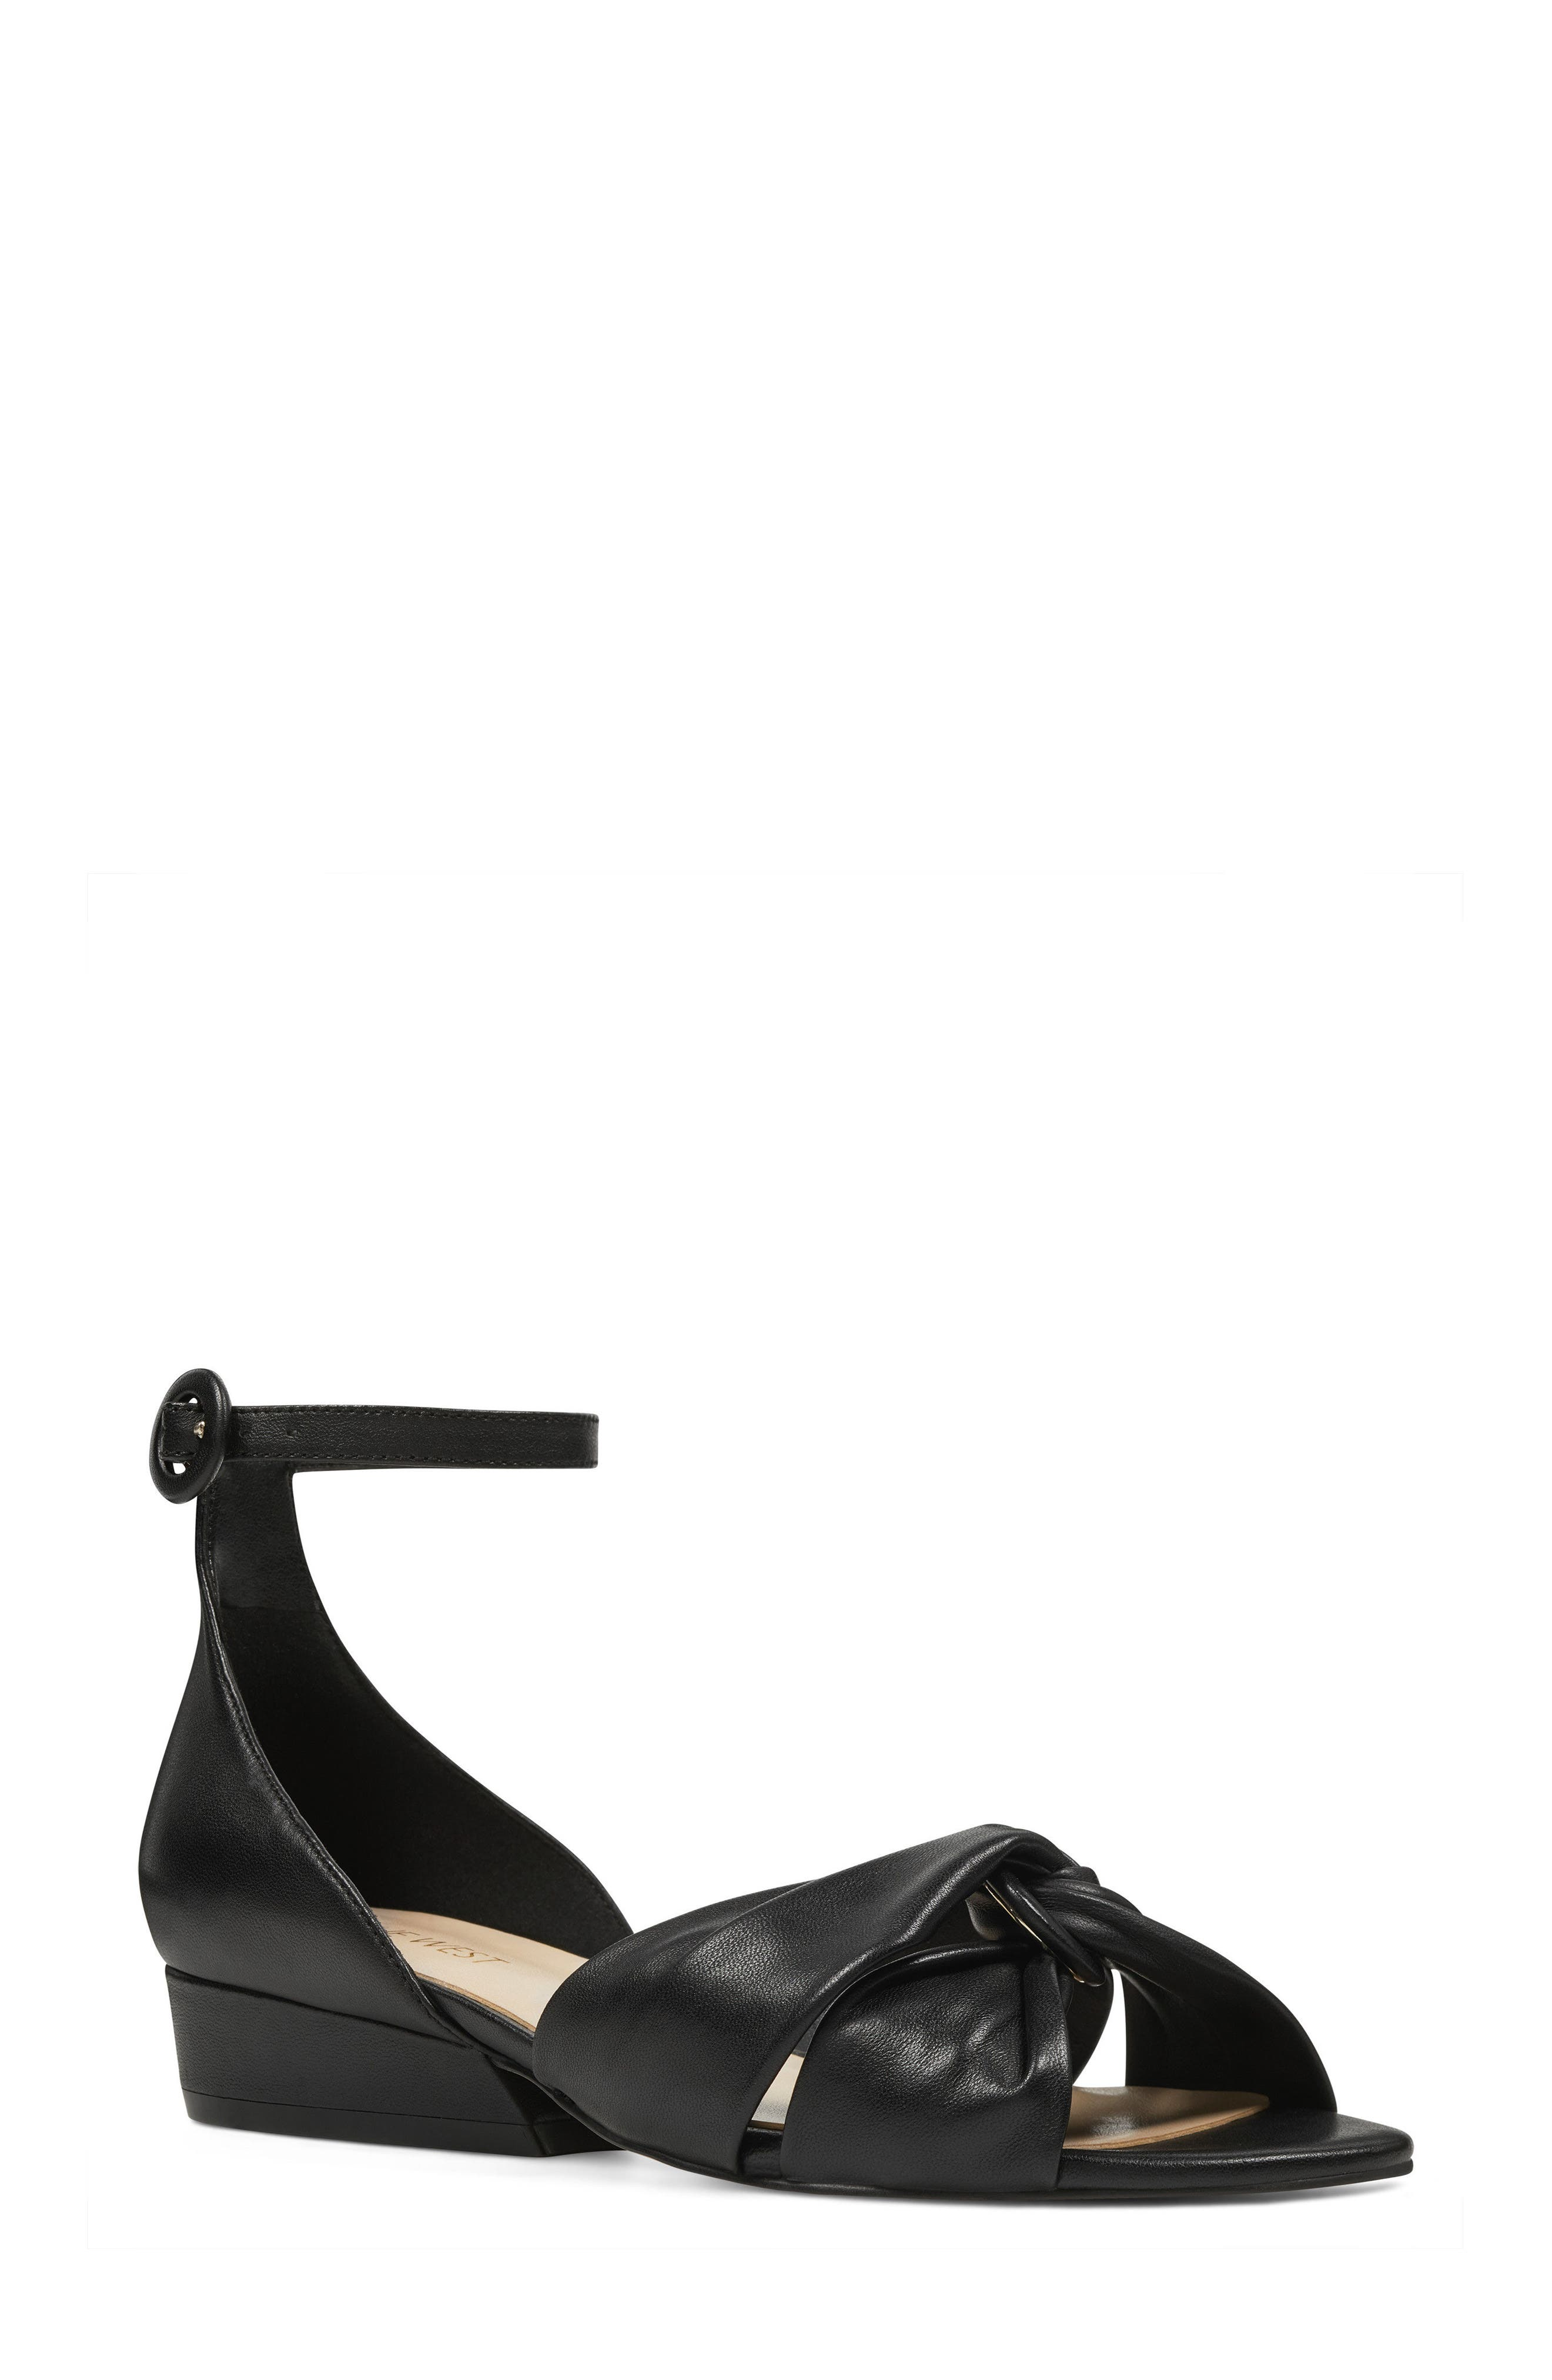 Lumsi Ankle Strap Sandal,                             Main thumbnail 1, color,                             Black Leather